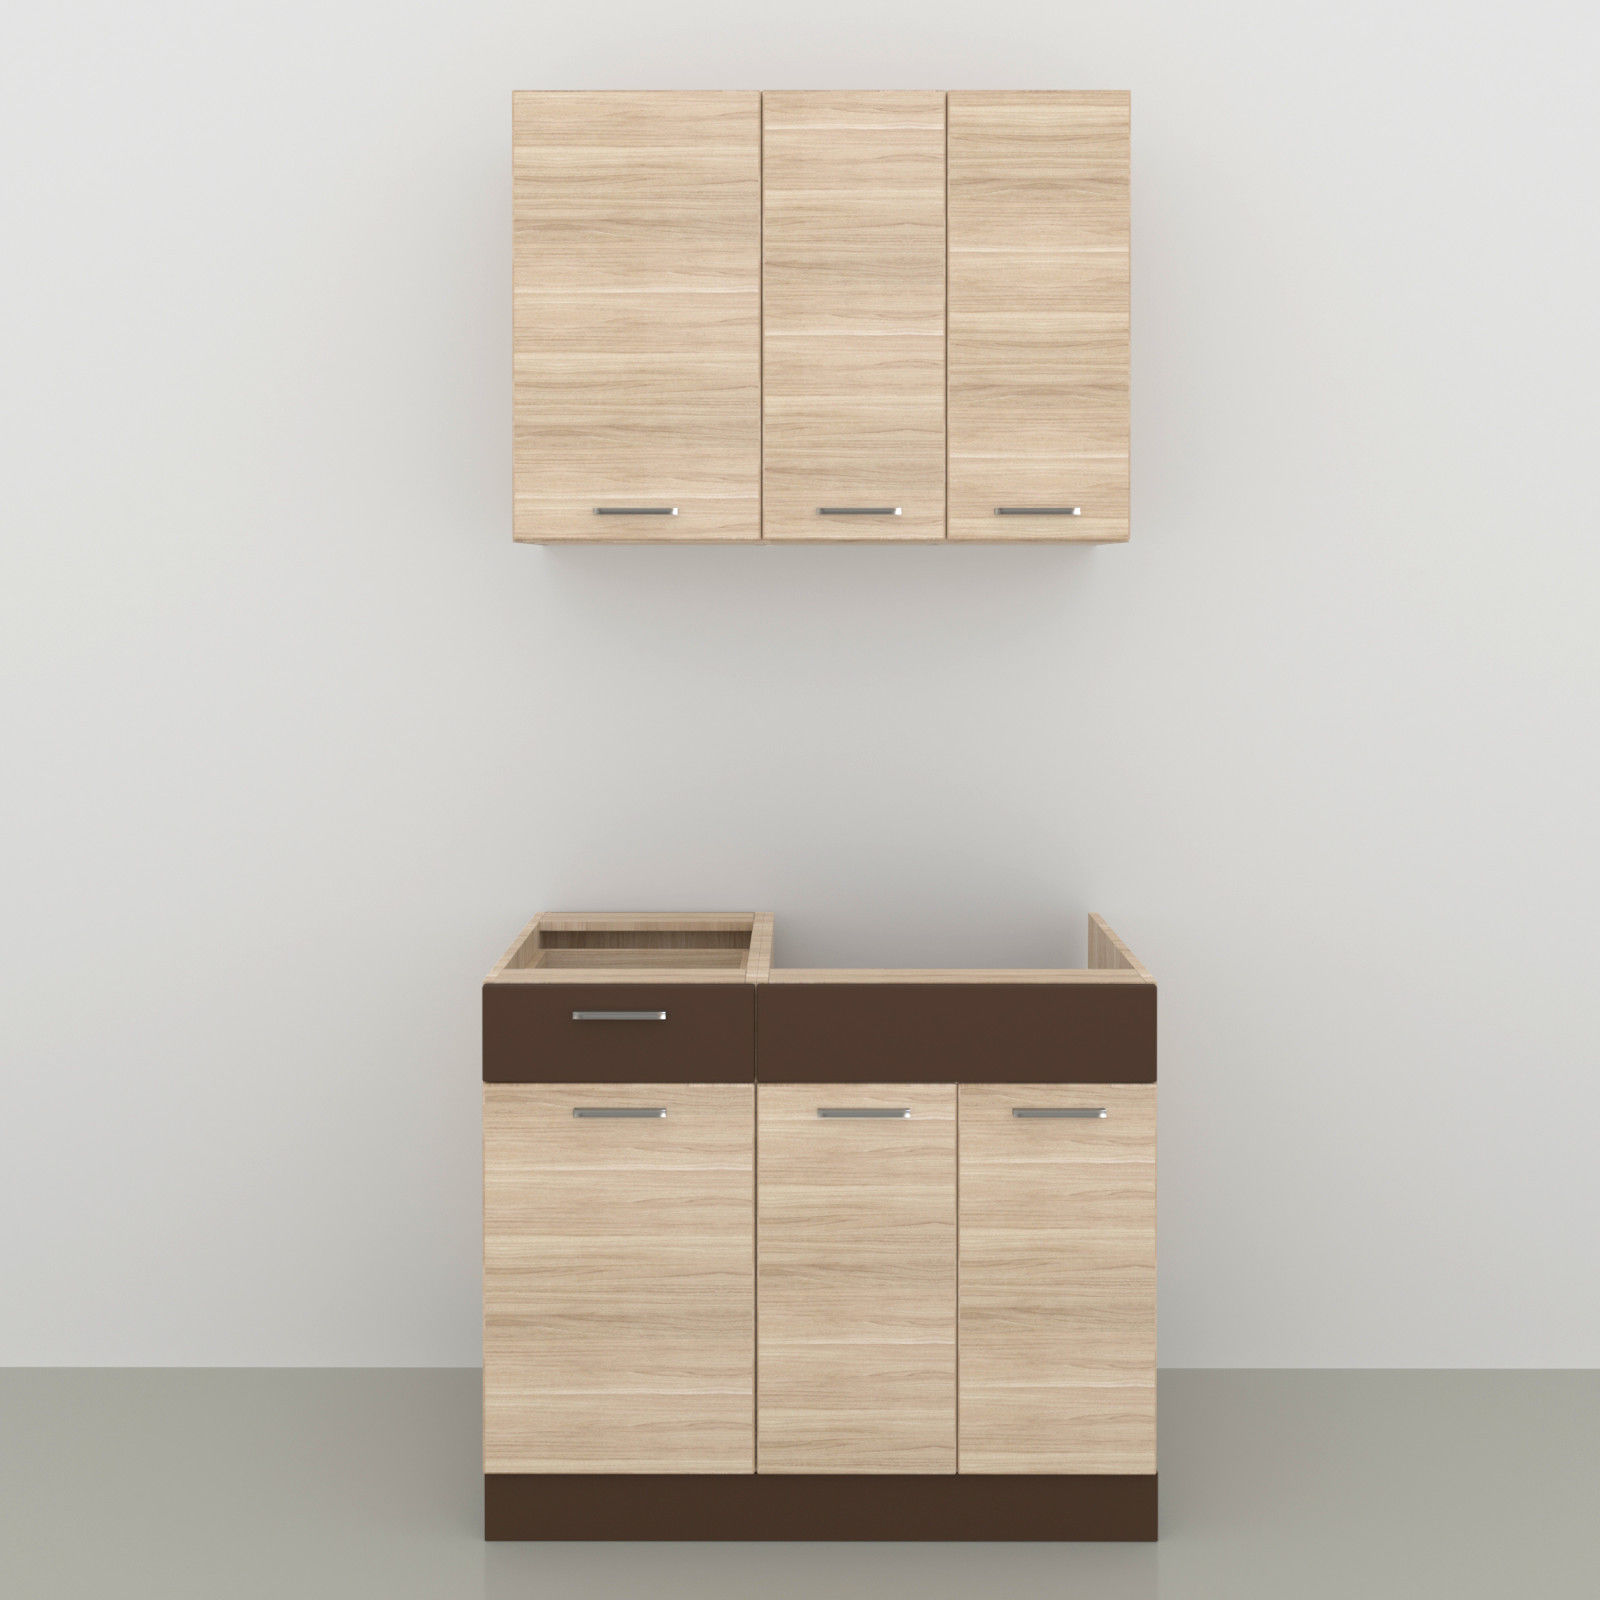 Küche ALINA 100 cm – Möbel DENA